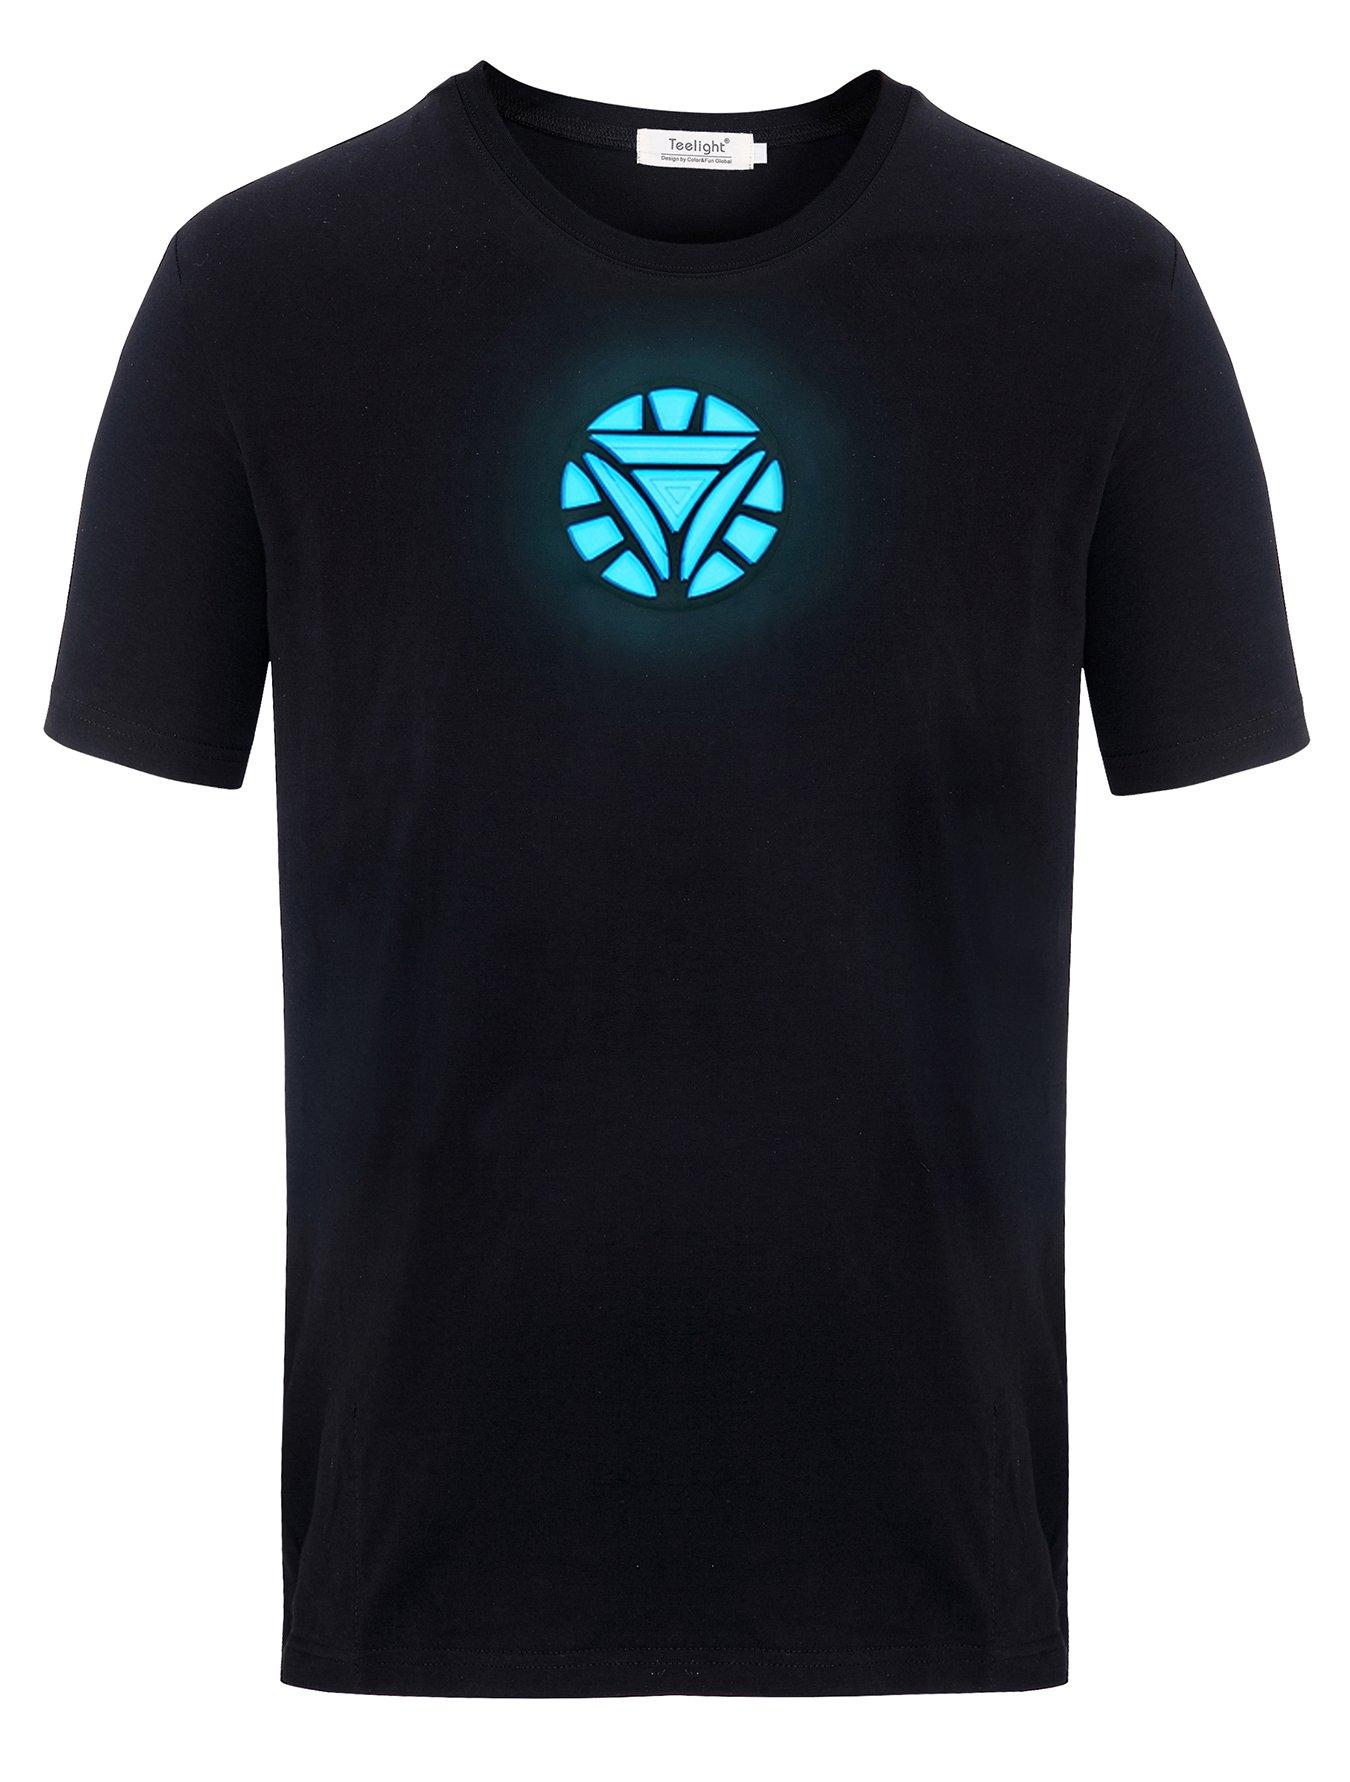 Tony Stark Light-Up Arc Reactor LED Iron Man 2 T Shirt, Black